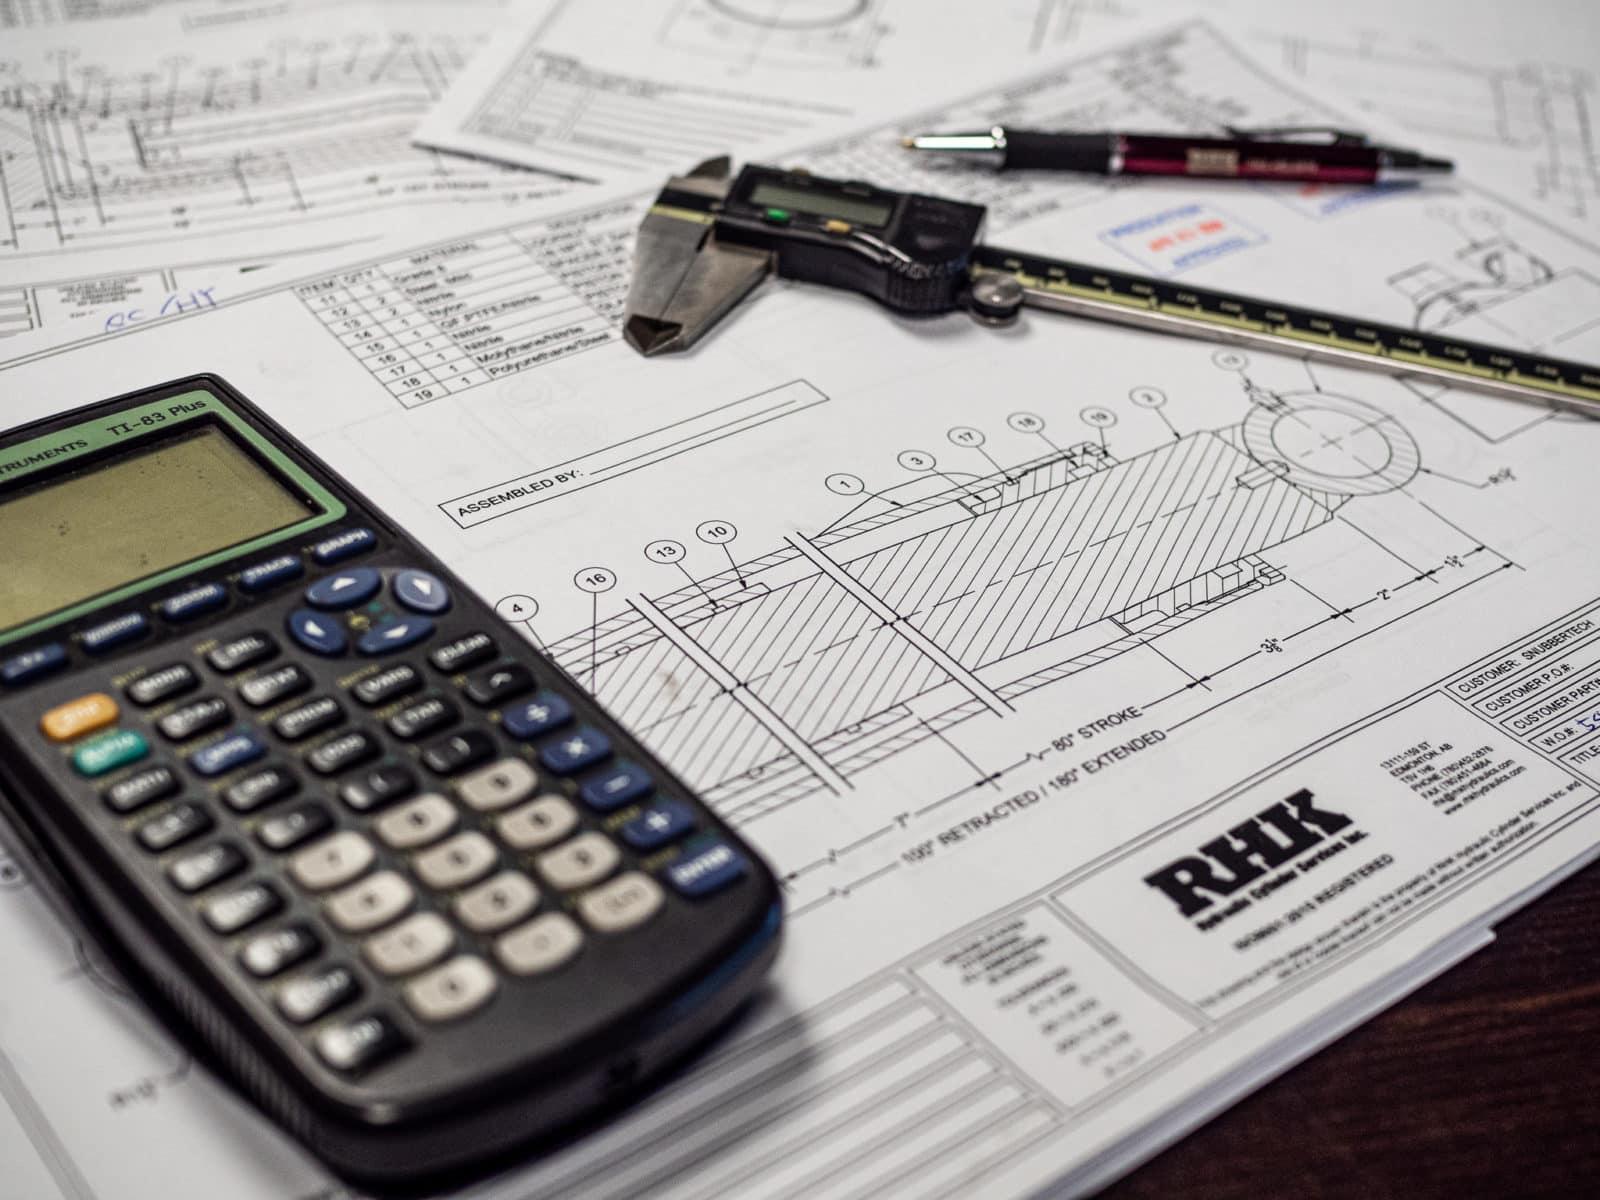 Hydraulic Cylinder Engineering Design Drafting Blueprints